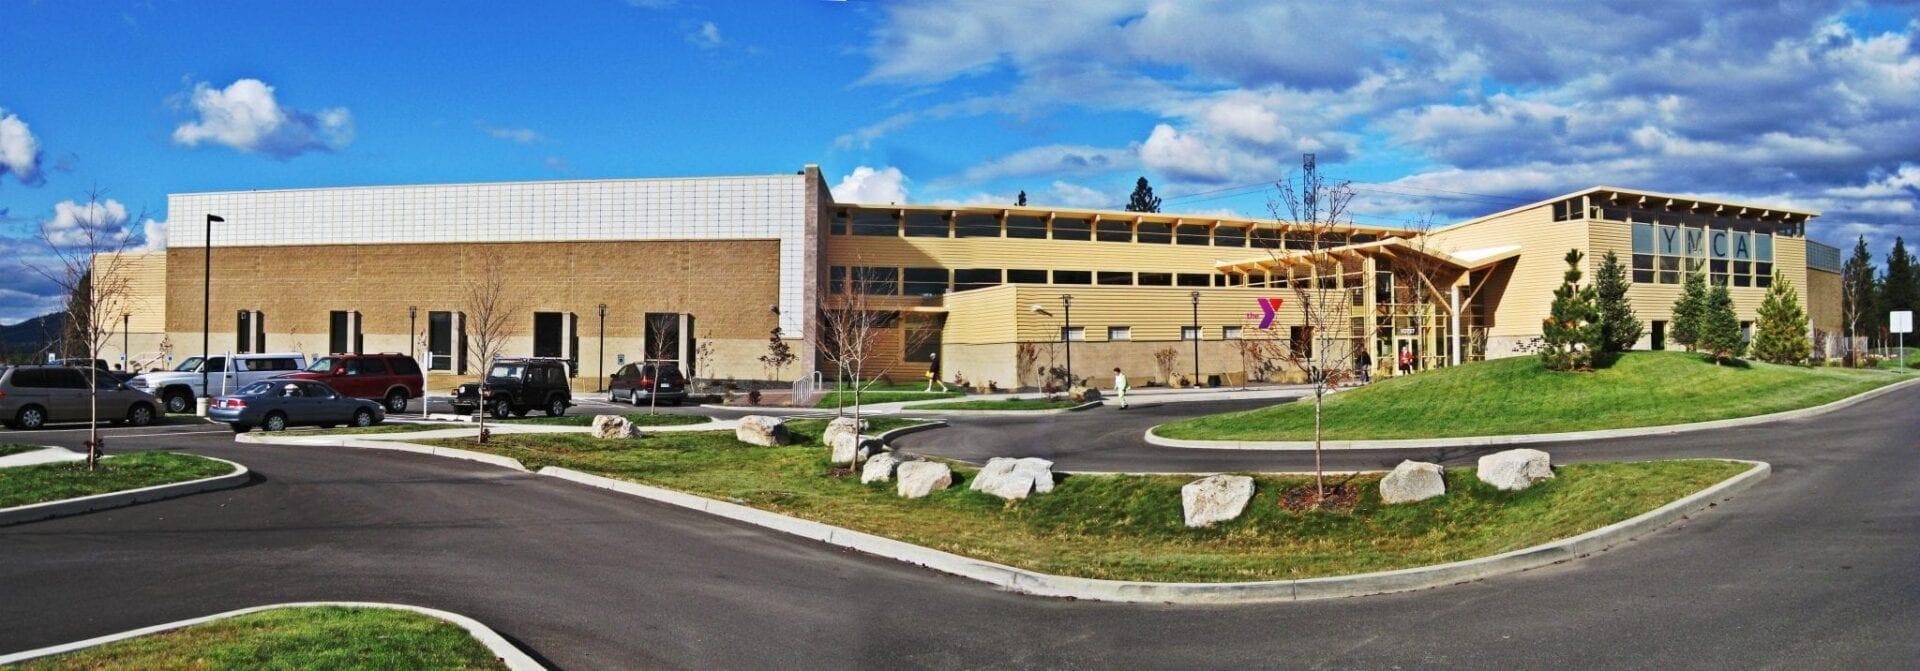 North Spokane YMCA Day 2011 cropped